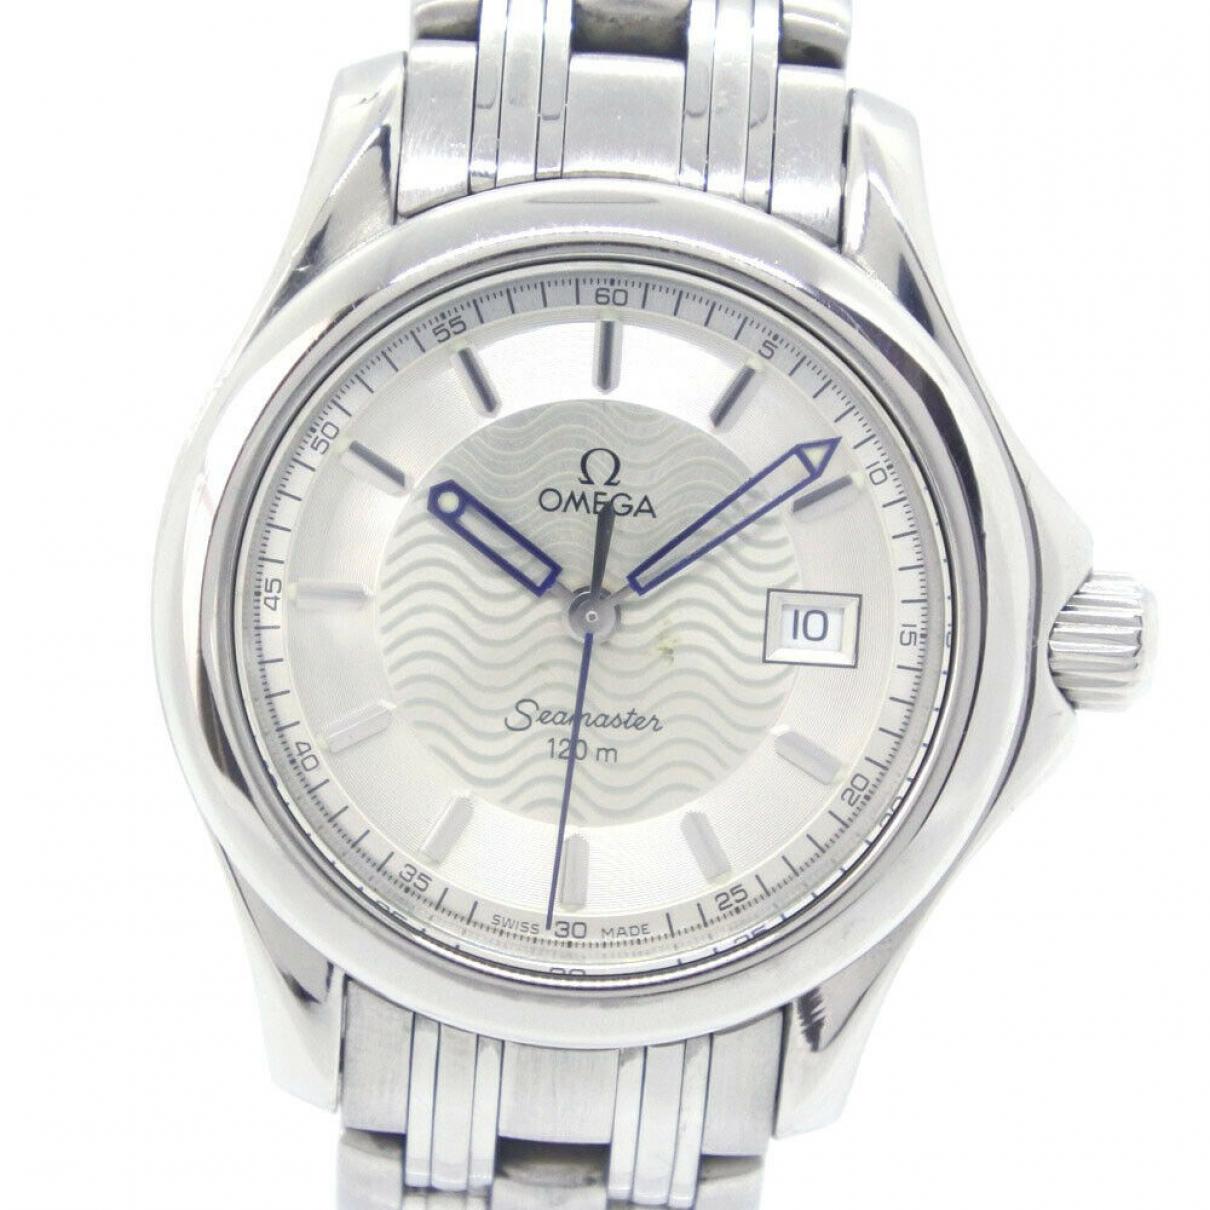 Reloj Seamaster 300 Omega